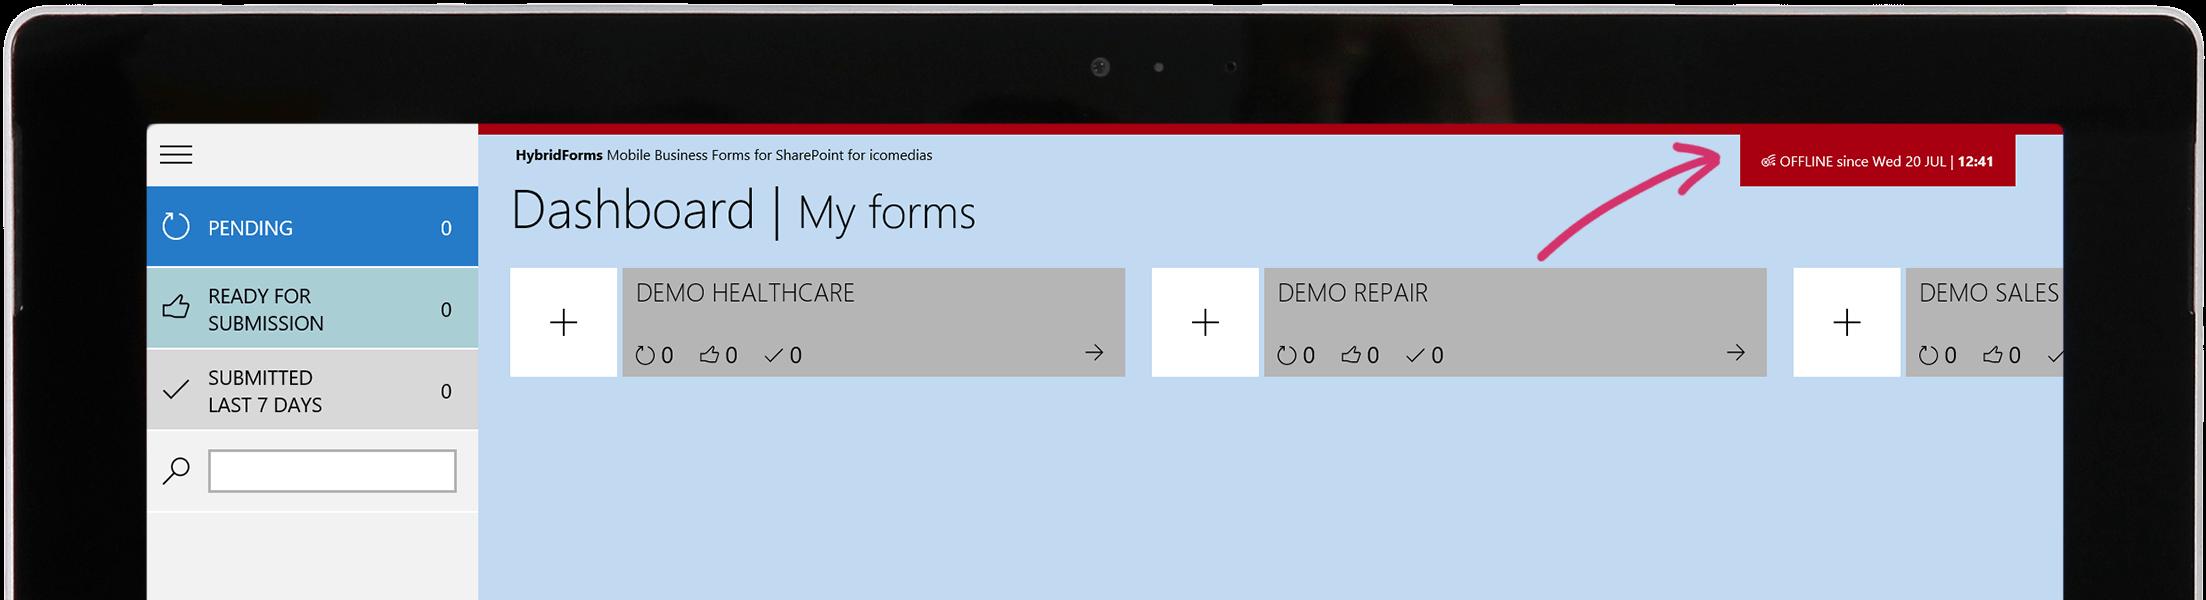 HybridForms Offline Mode